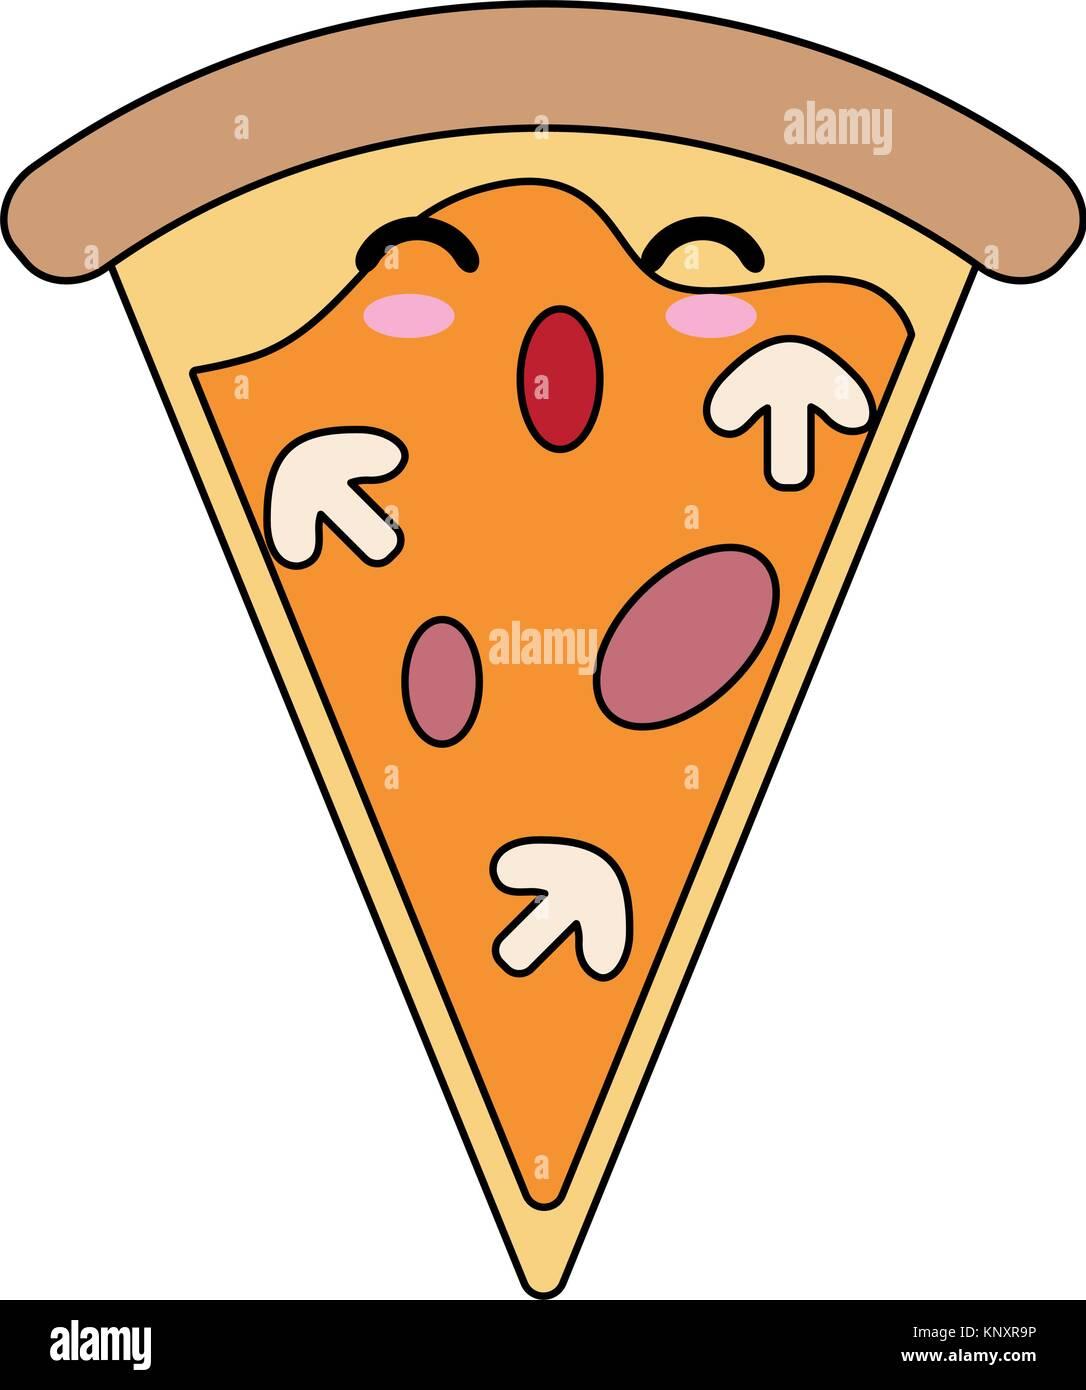 Comida Italiana Pizza Kawaii Cute Dibujos Animados Icono Ilustración